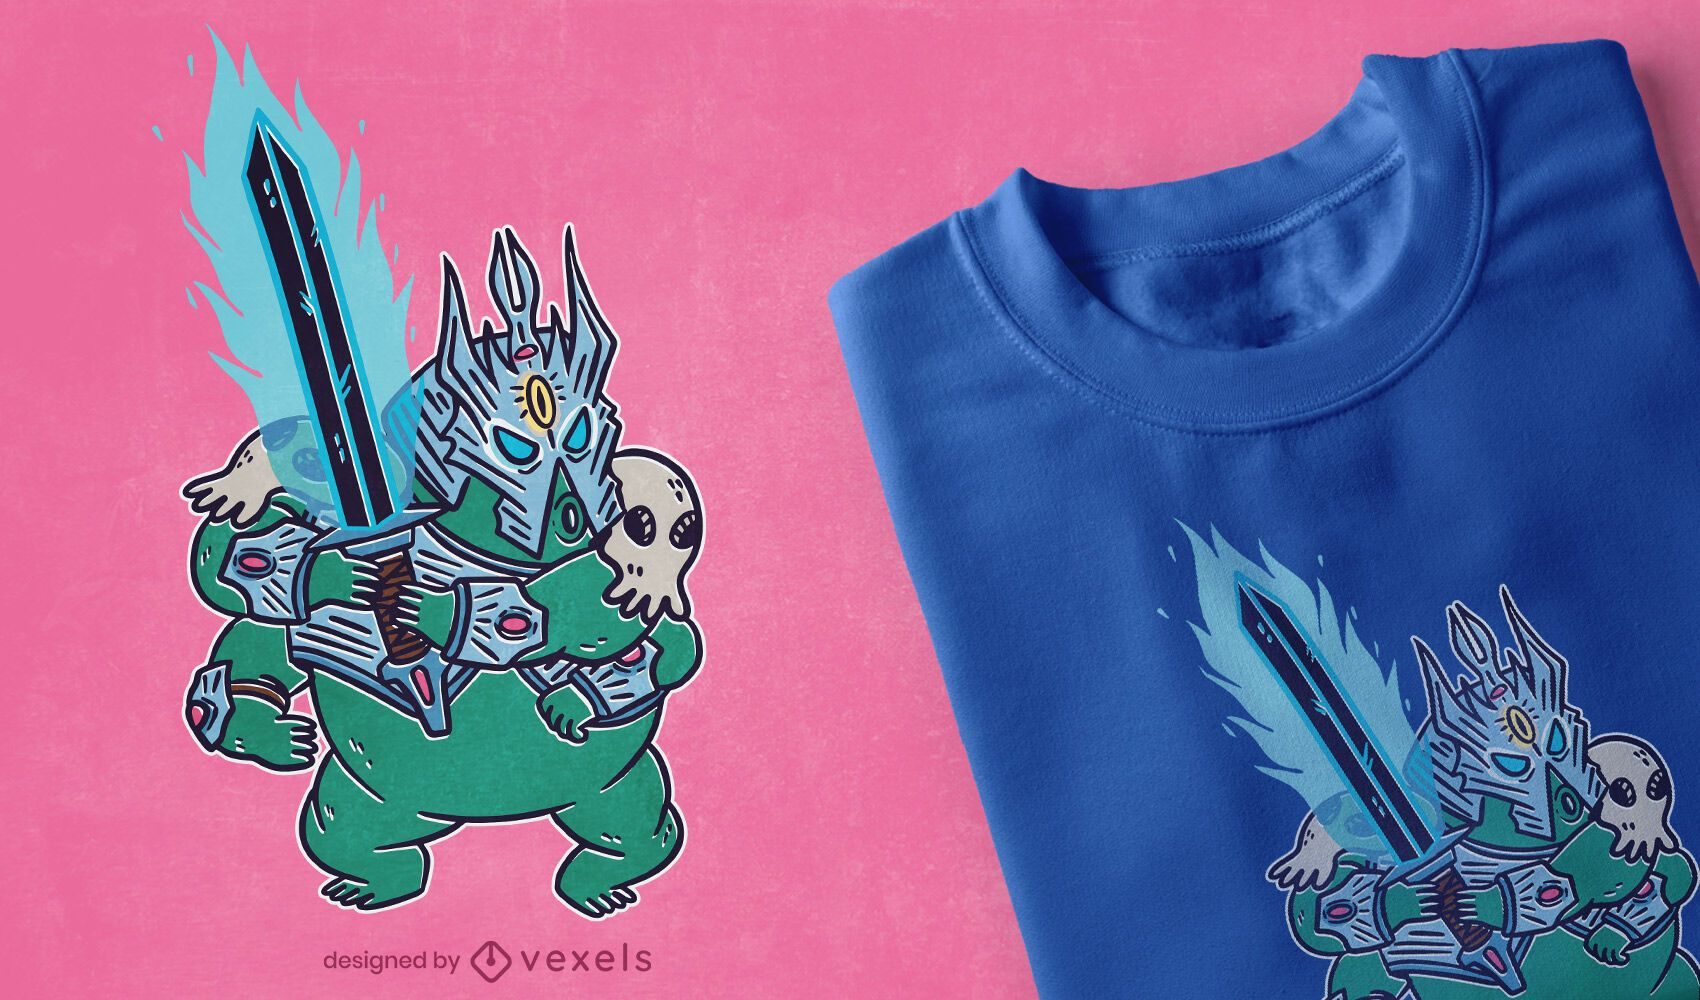 Tardigrade warrior RPG t-shirt design